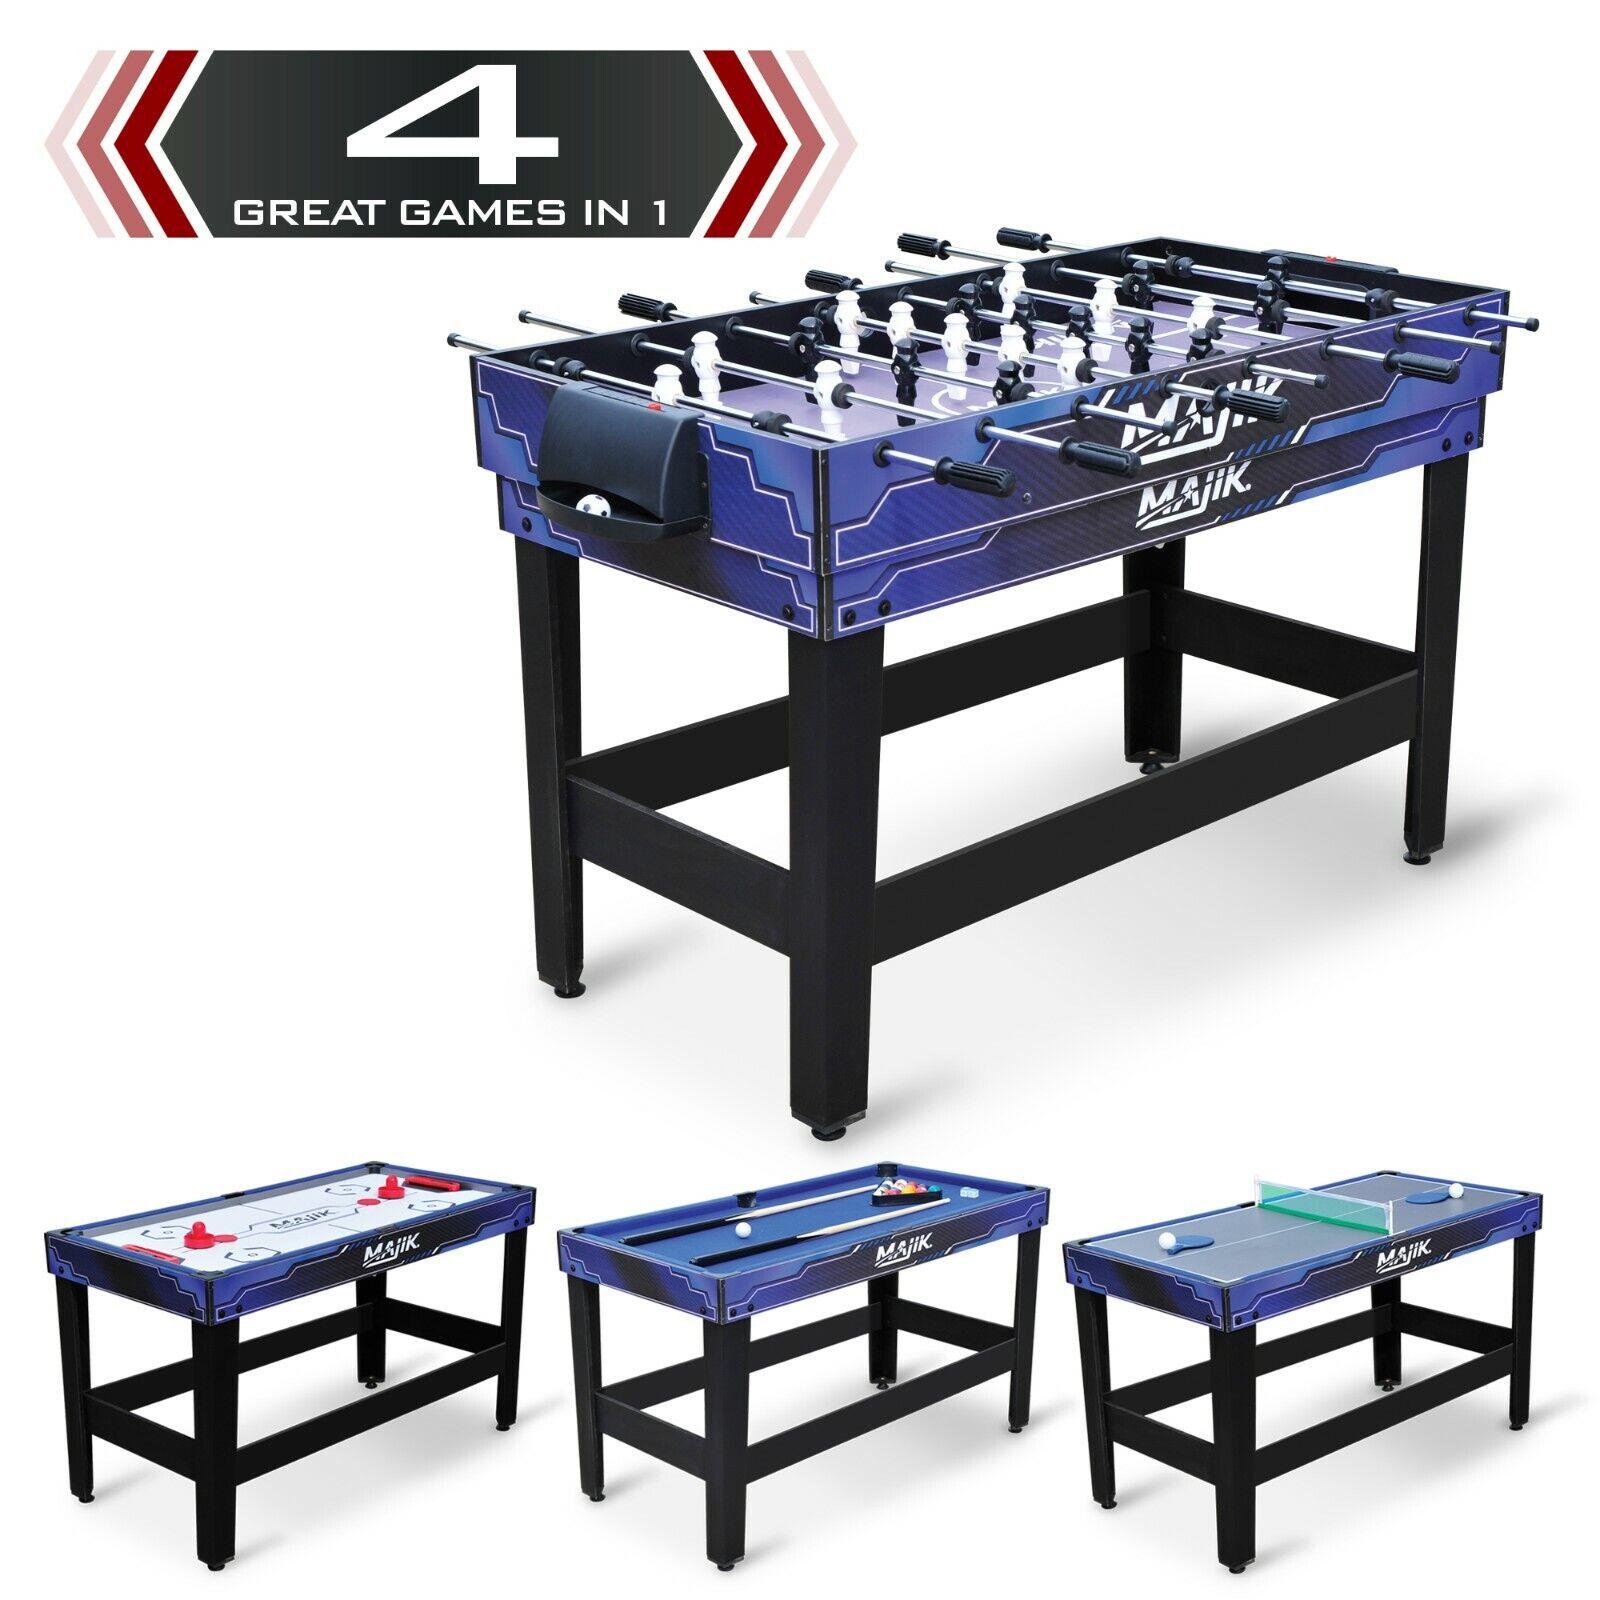 Pool Table 4-in-1 Combo 54 Inch Billiards Hockey Tennis Foos